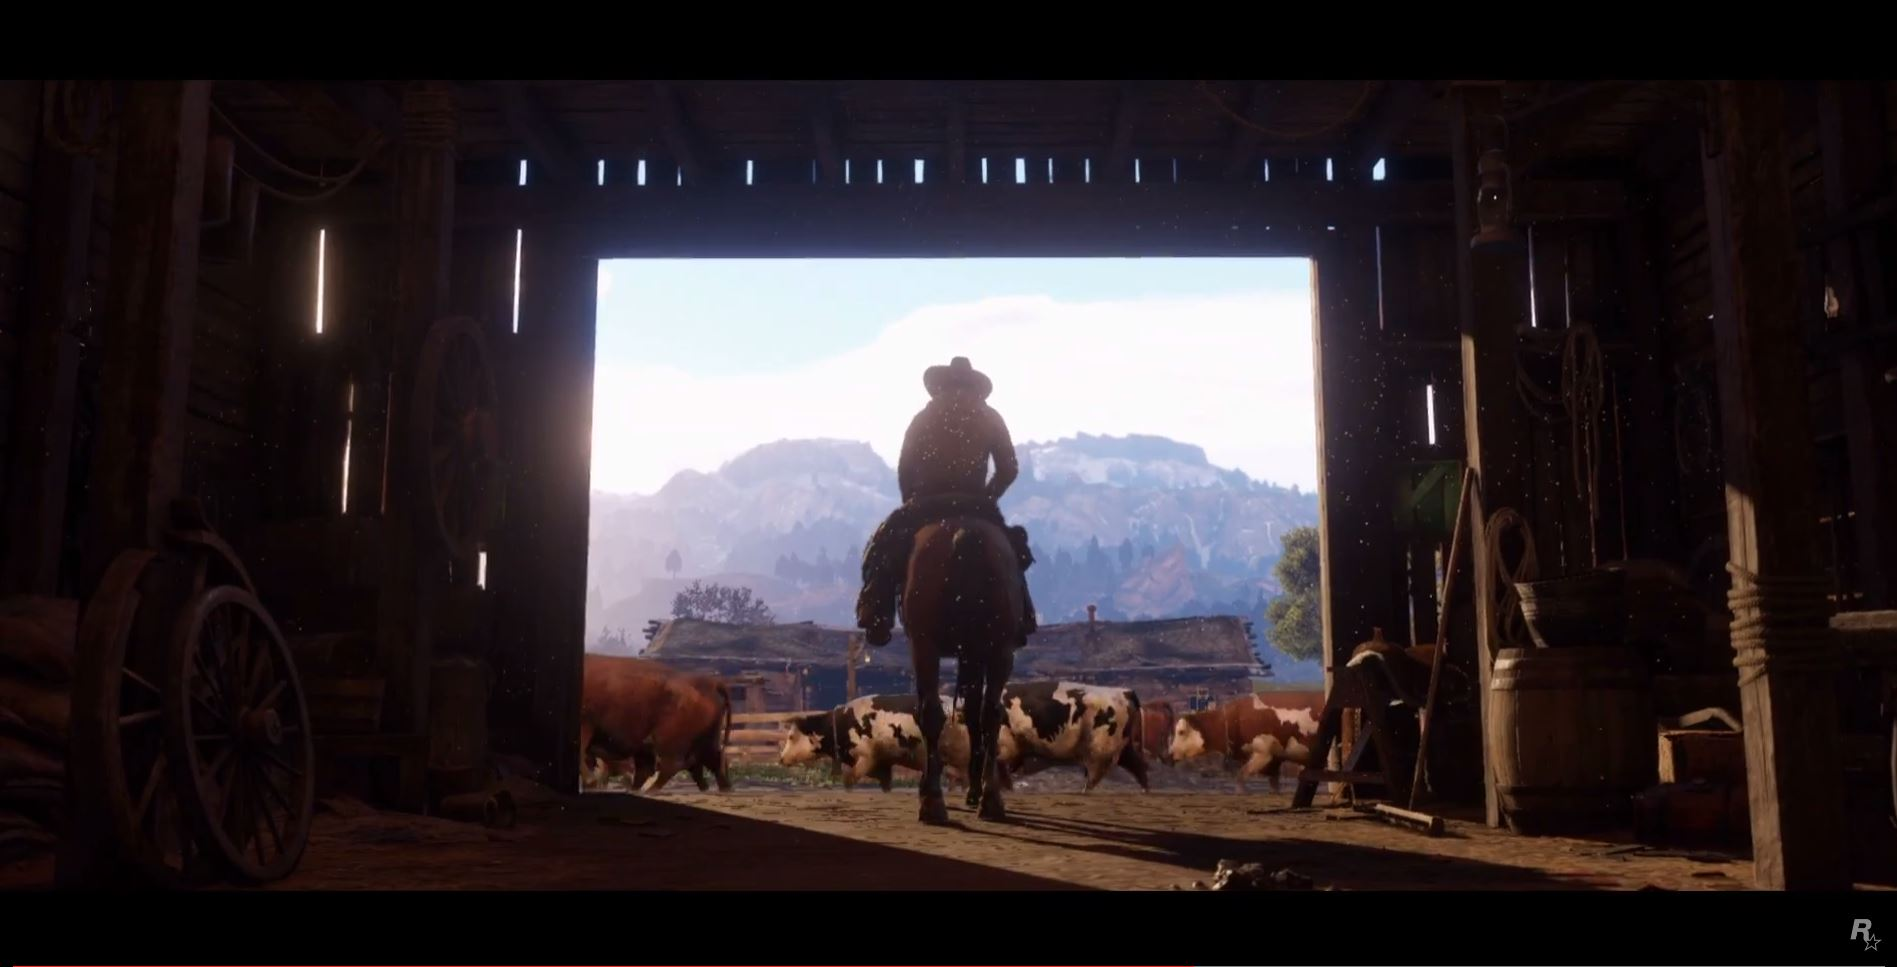 Red Dead Redemption 2: Seht hier den offiziellen Trailer!